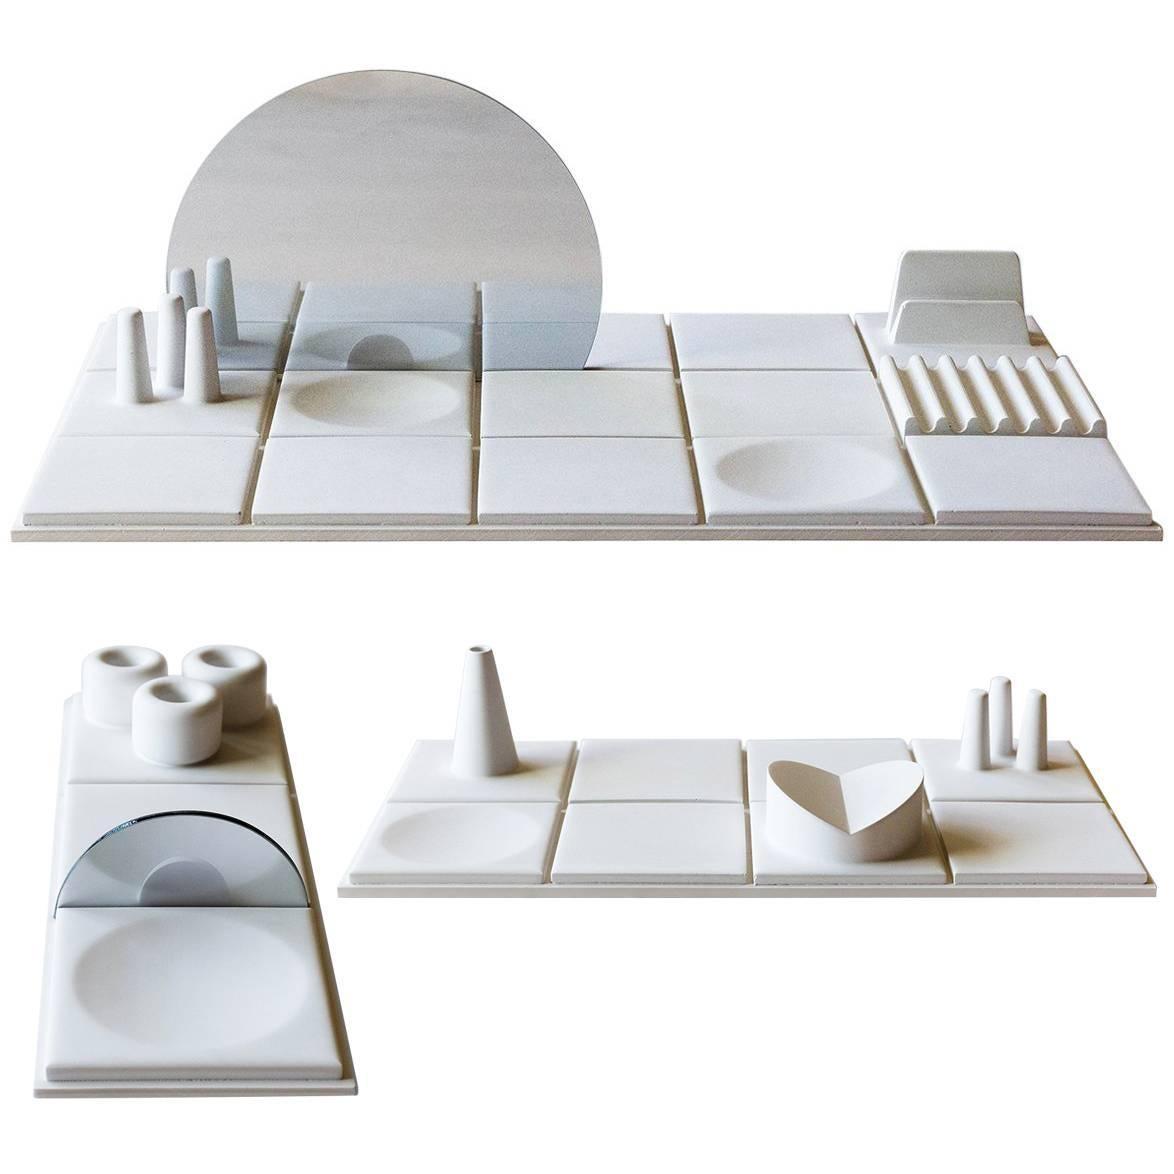 Salle de Bain, Set of Three, Handmade Cast Concrete Tray in White by UMÉ Studio